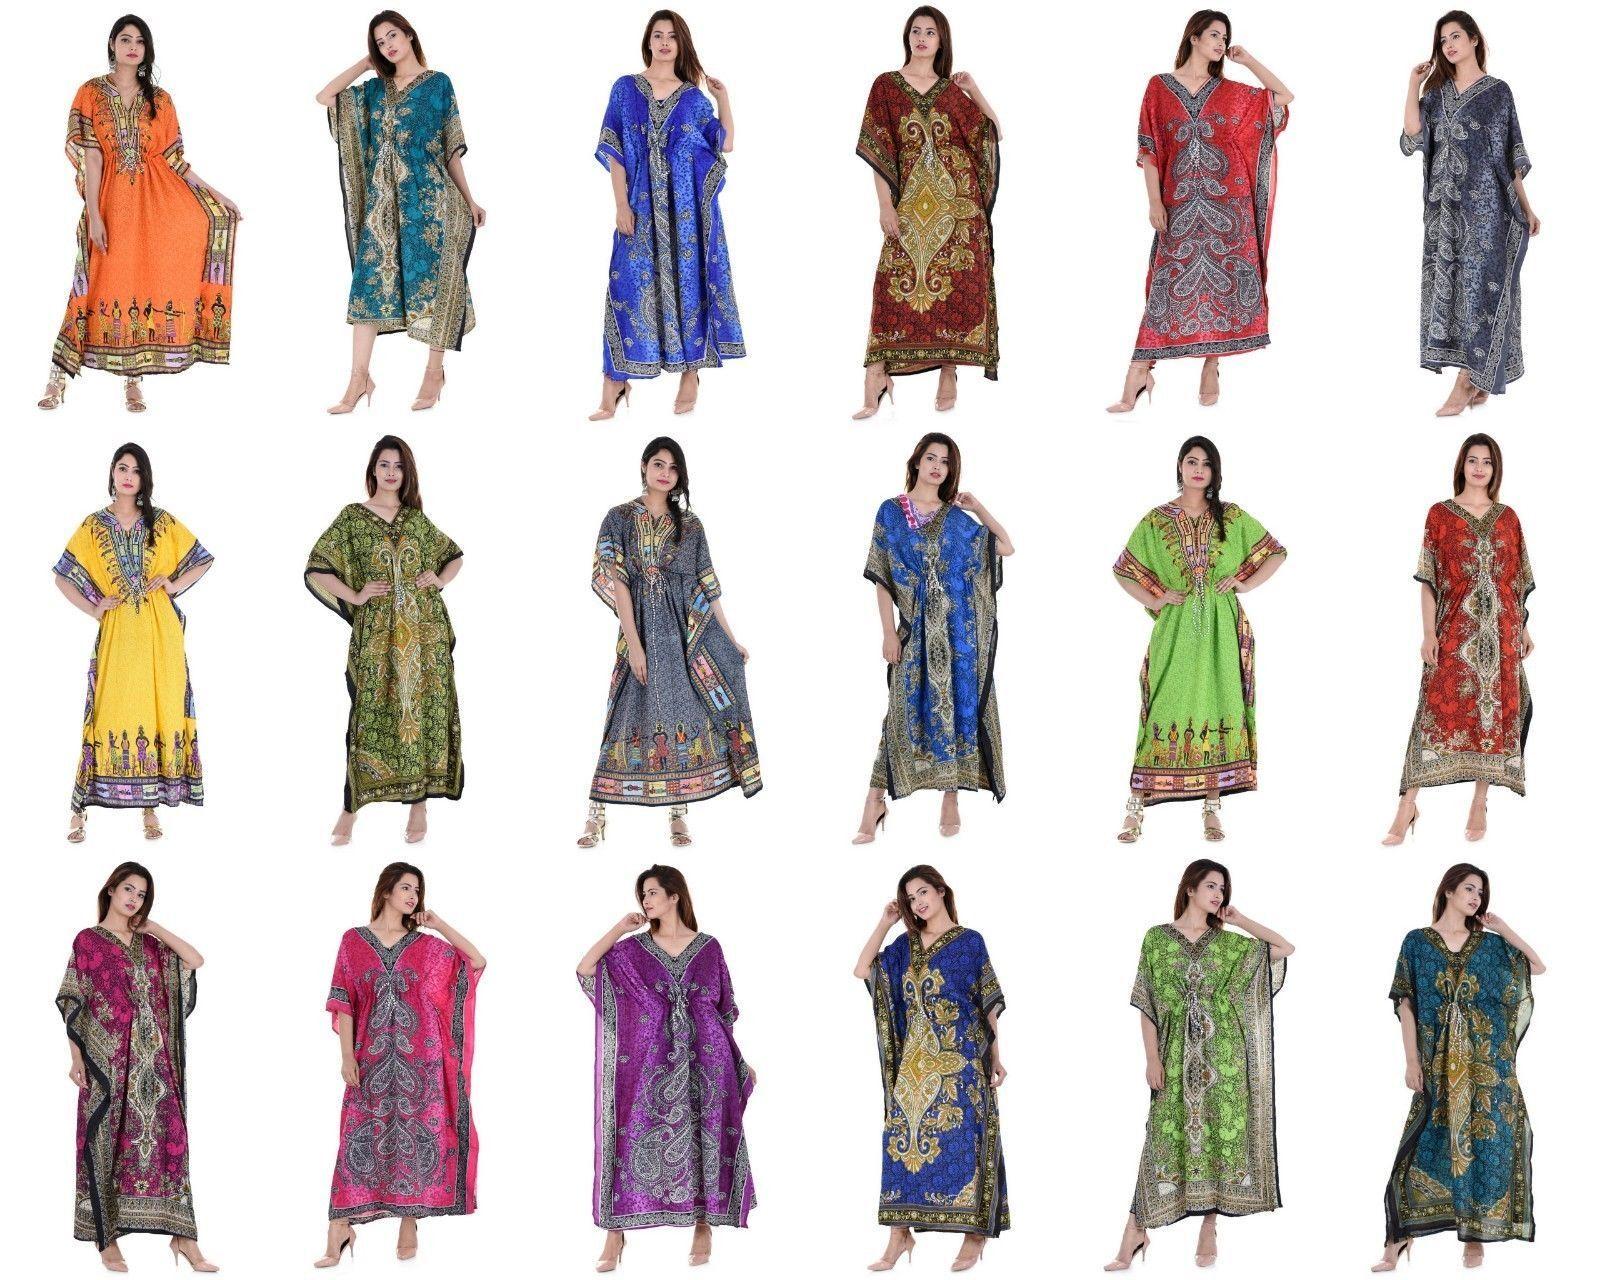 50 Pcs Valentin's Day Gift Assorted  Women Long Kaftan One Size Plus Caftan-Maxi